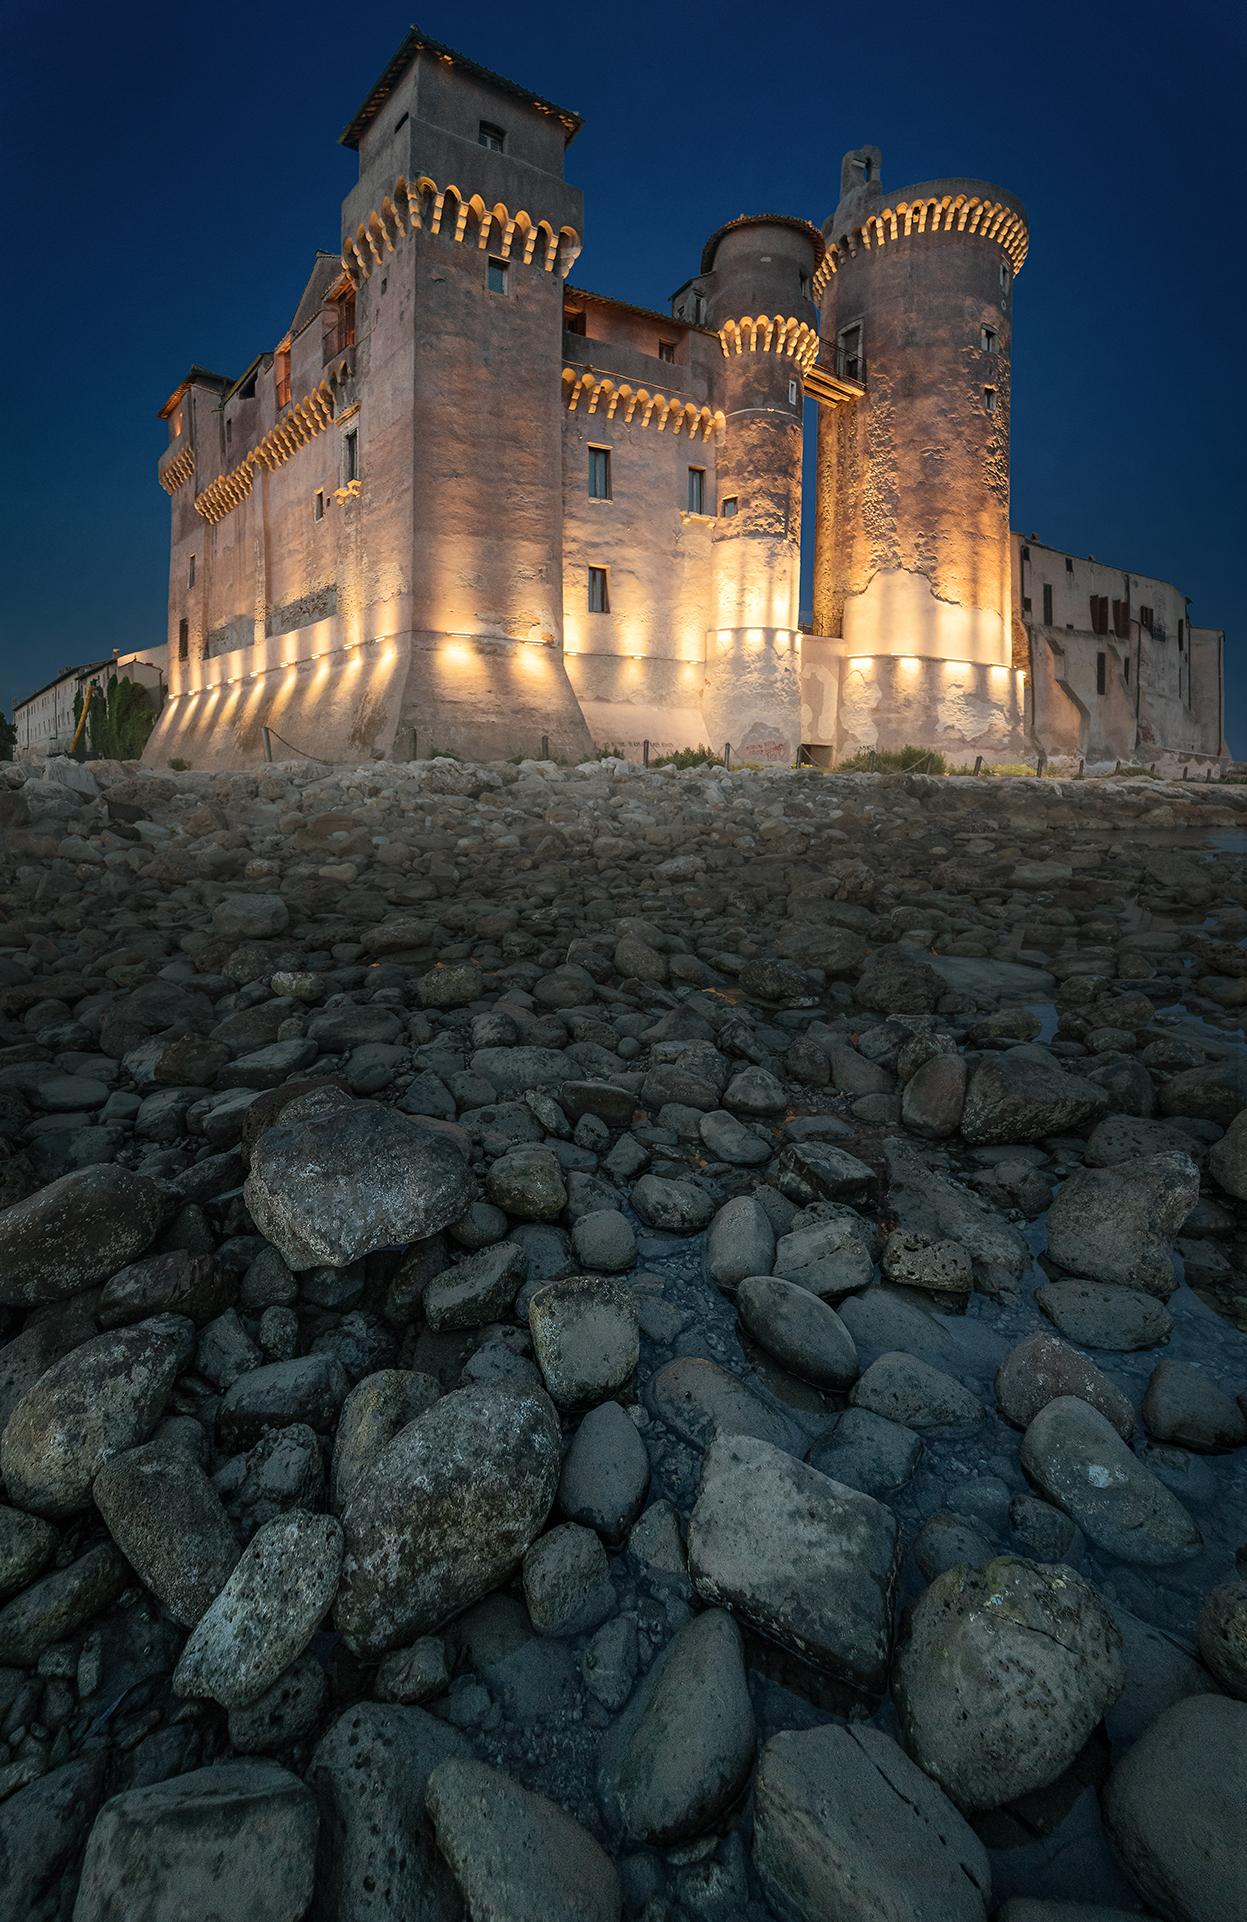 Blue time at Santa Severa Castle...